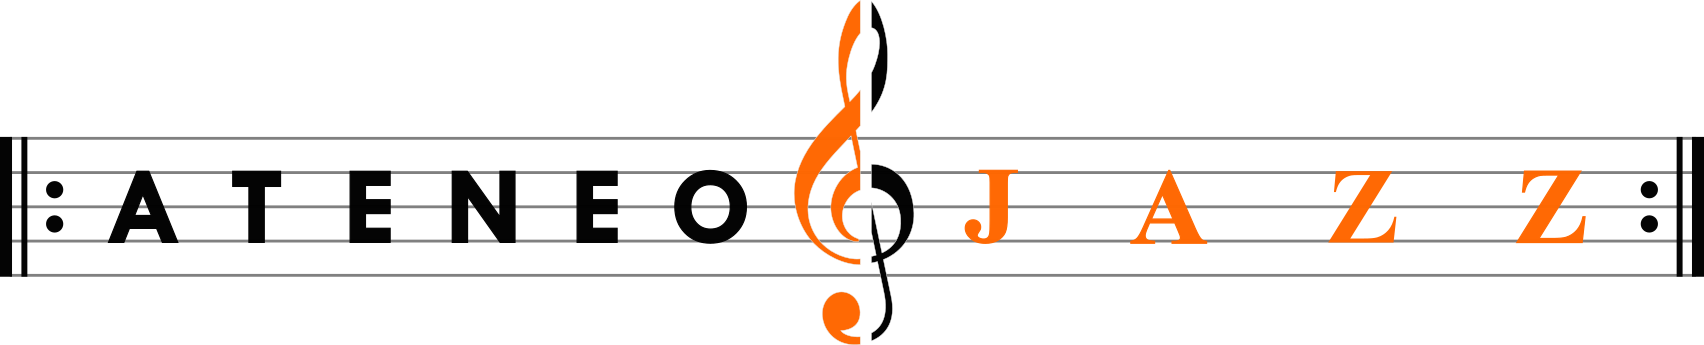 ateneo jazz